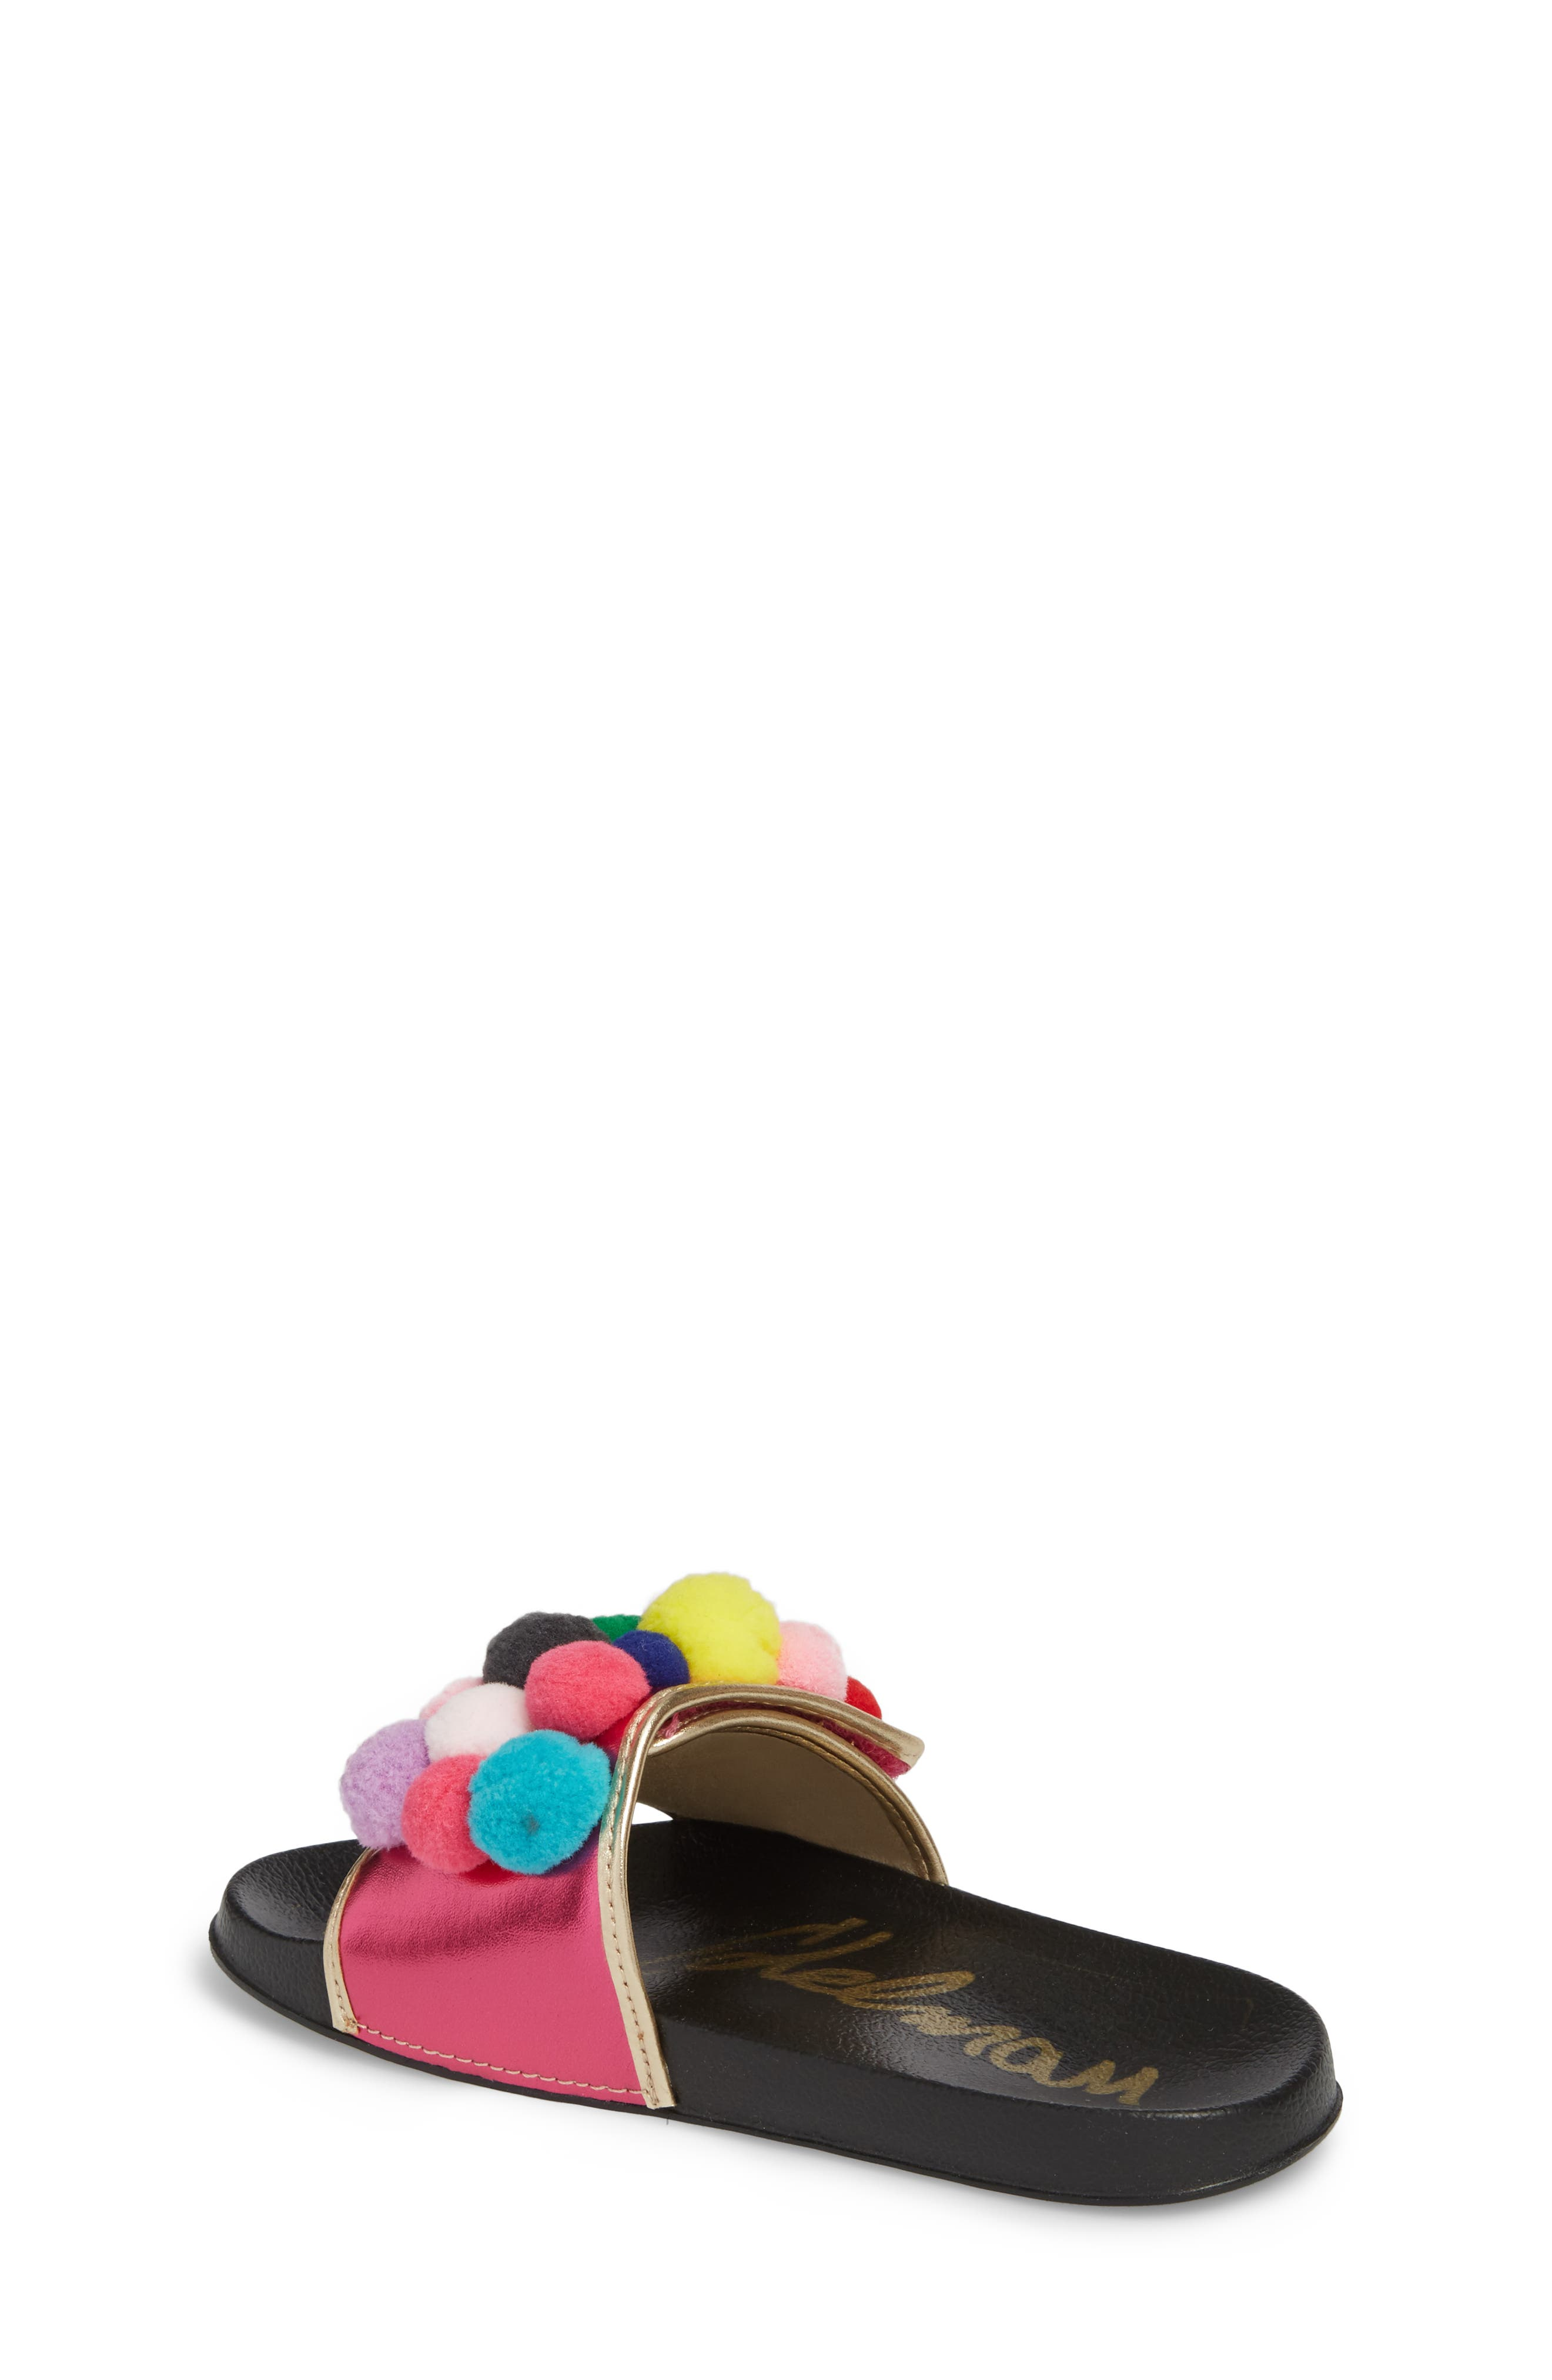 Faux Fur Mackie Cayman Sandal,                             Alternate thumbnail 2, color,                             697